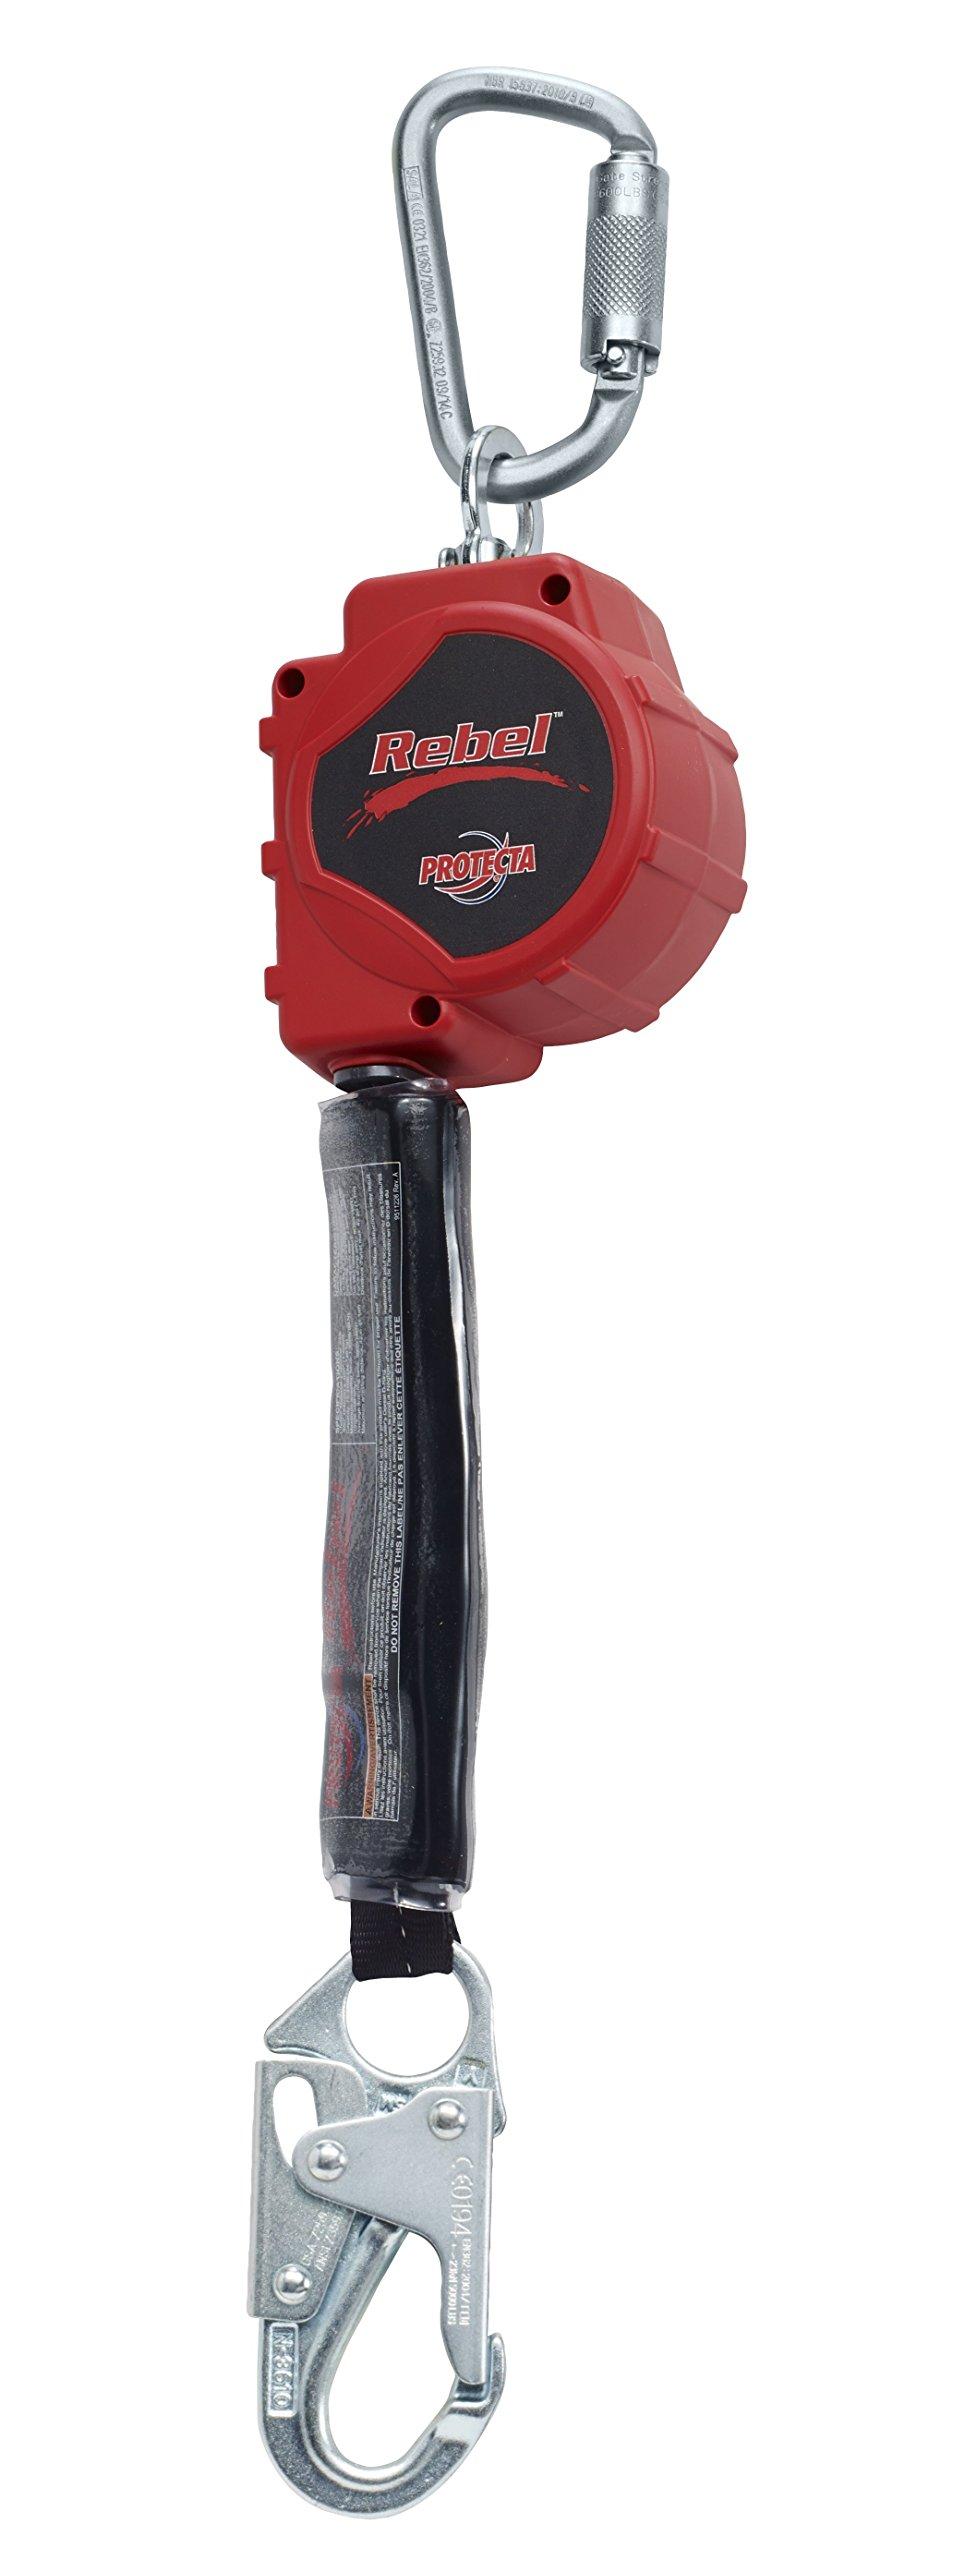 3M Protecta Rebel Self Retracting Lifeline, Steel Snap Hook & Carabiner, 11', 3100425